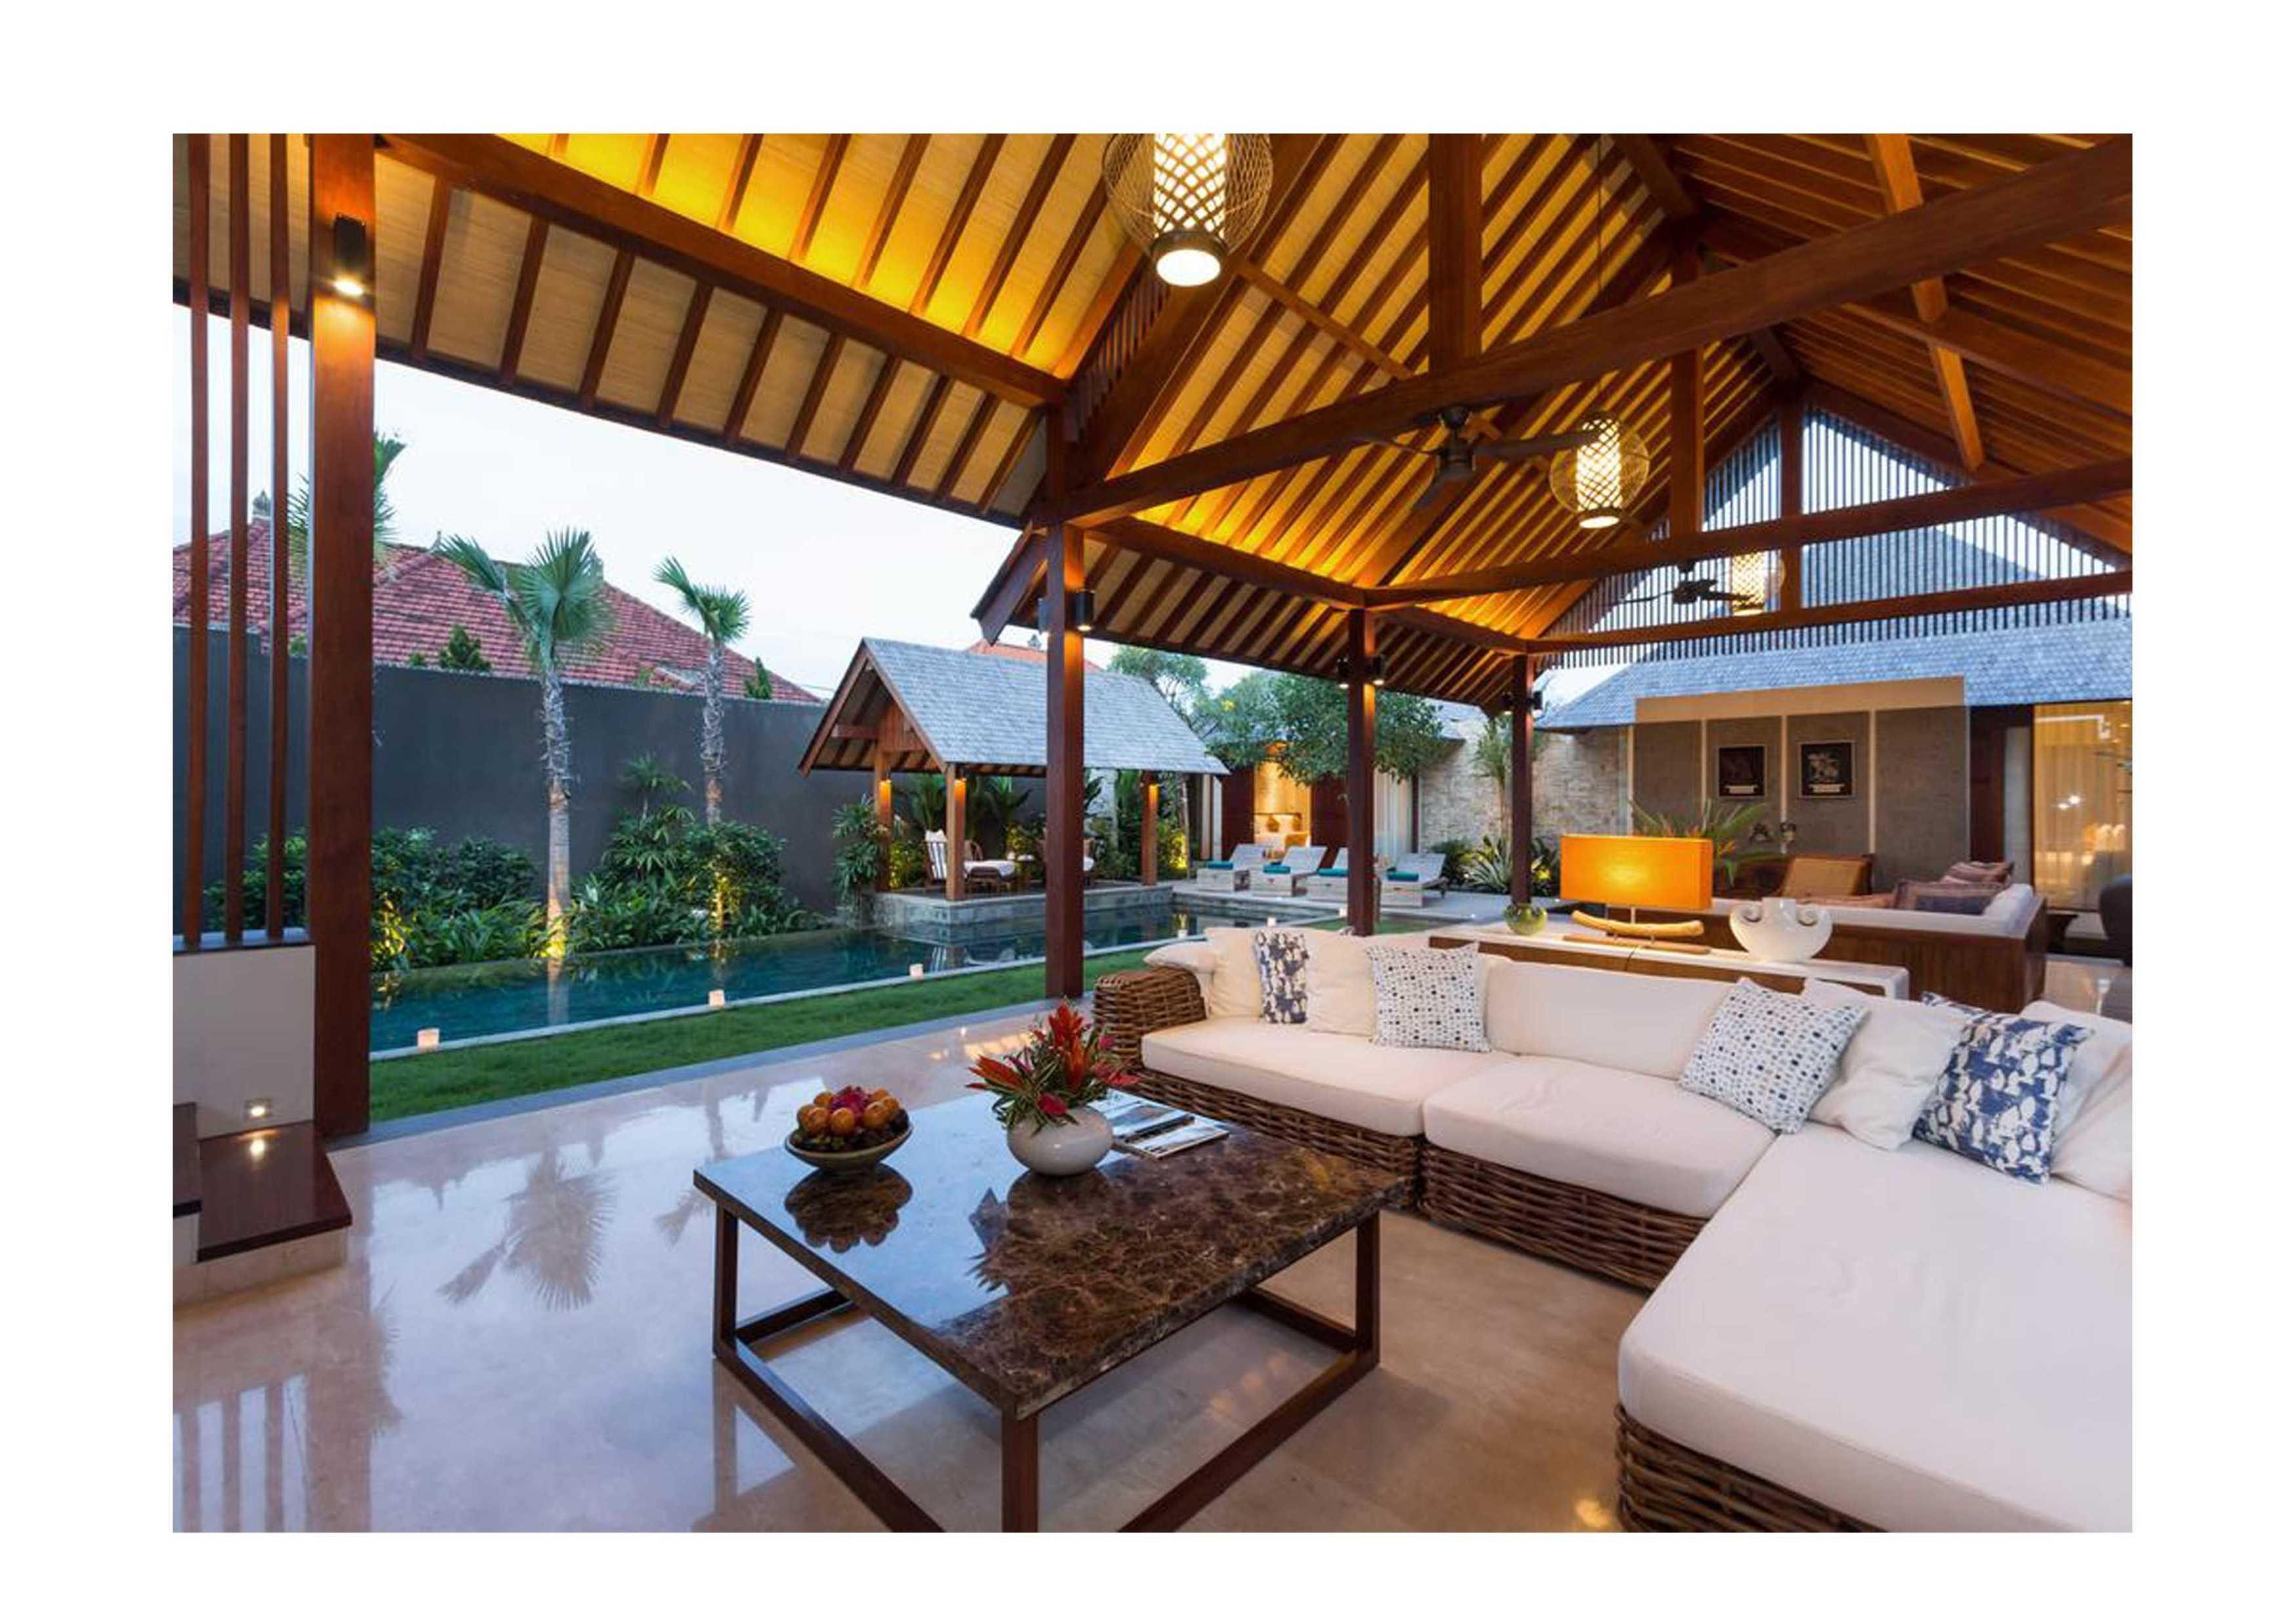 Revan Teggar Tegal Cupek Villa Kerobokan, Bali Kerobokan, Bali Revan-Teggar-Tegal-Cupek-Villa   107024